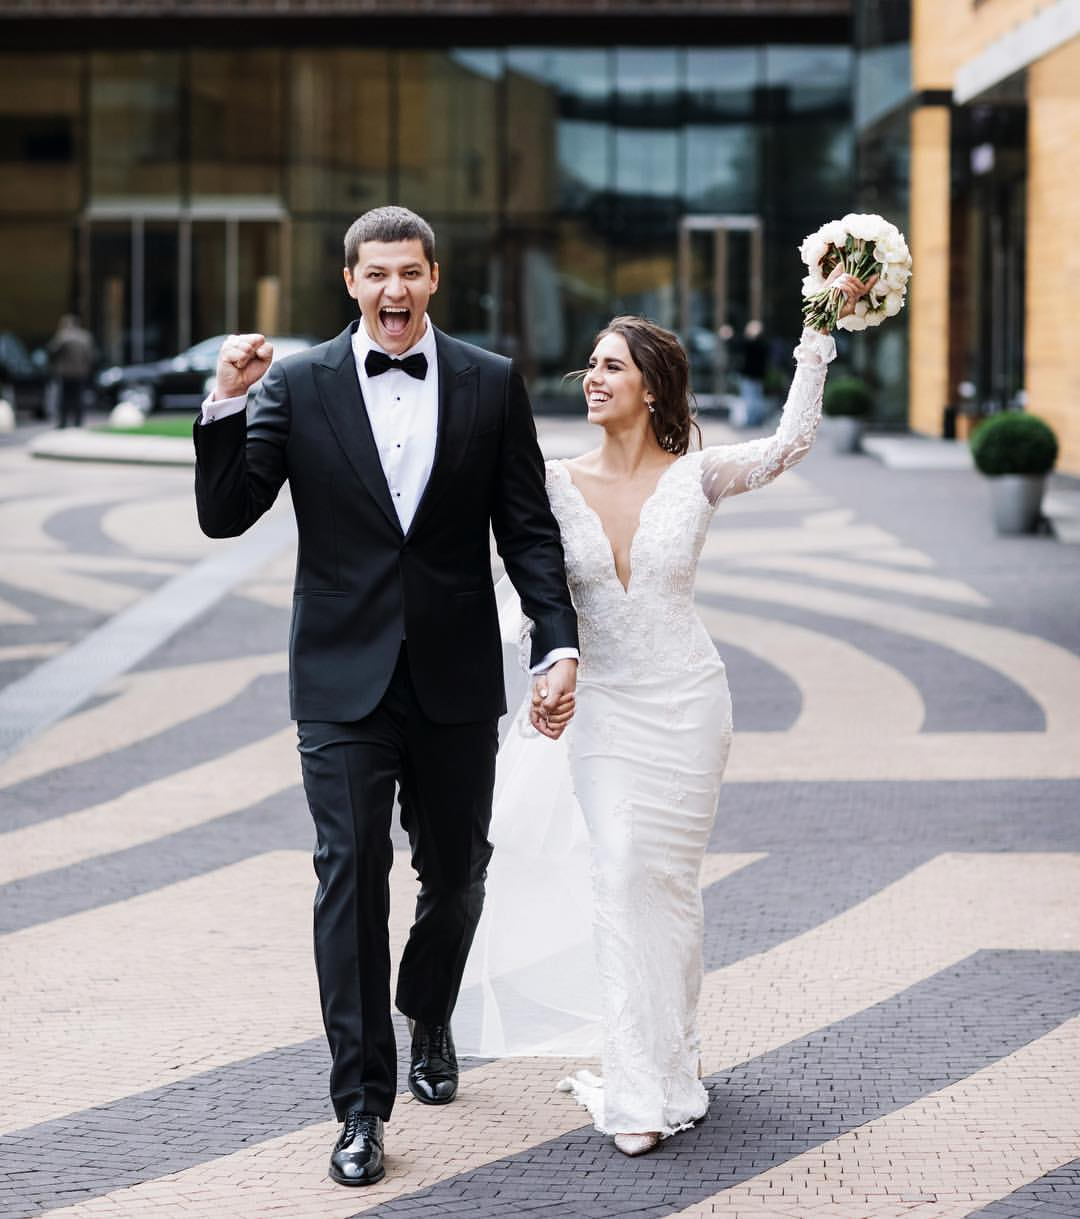 Мамун маргарита вышла замуж за